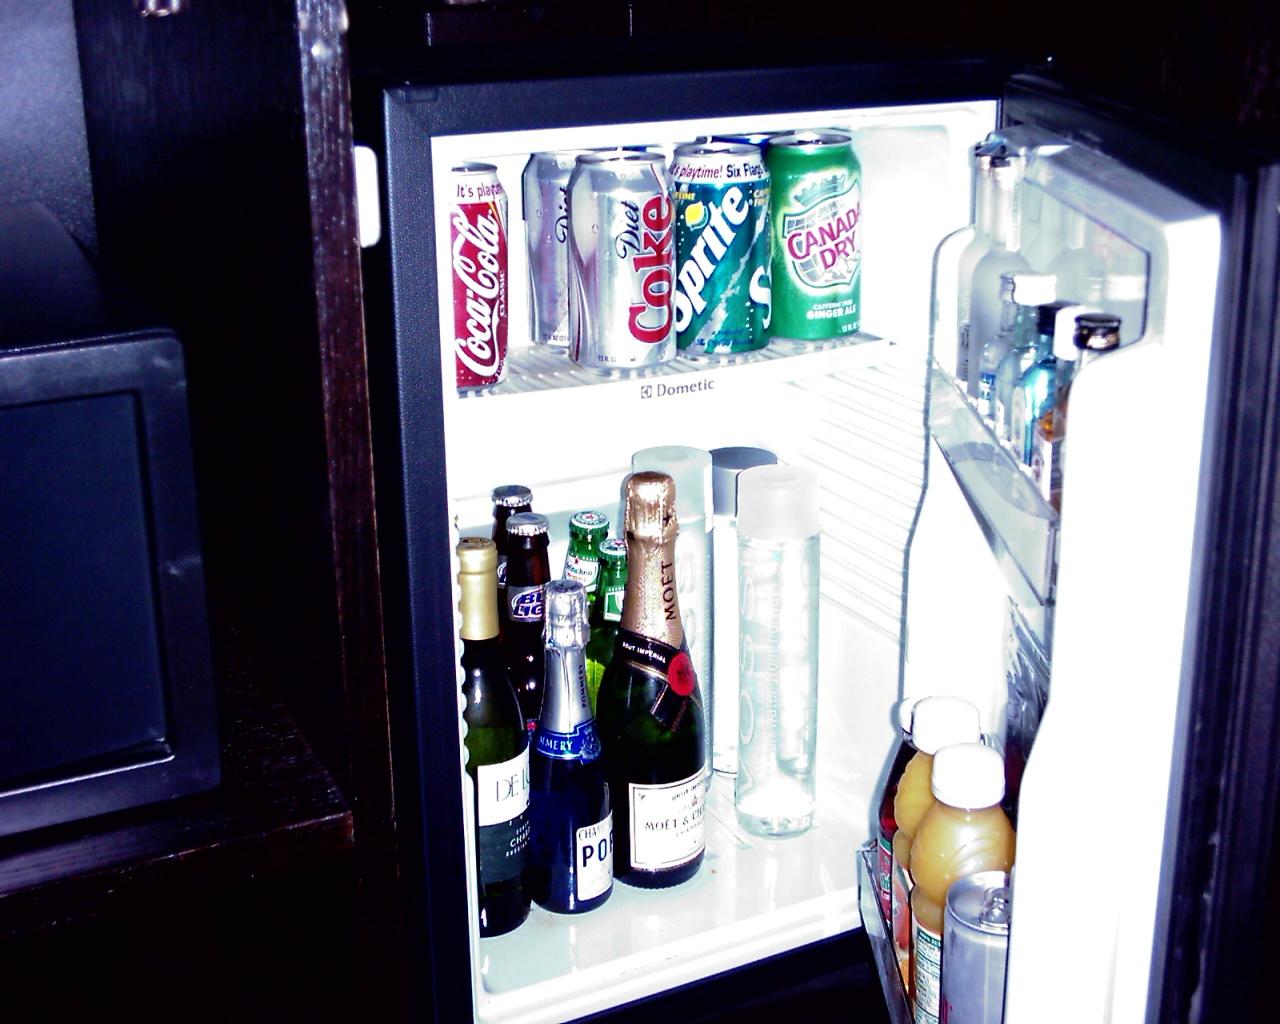 Mini Kühlschrank Leihen : Absorber kühlschrank wikipedia margaret salisbury blog